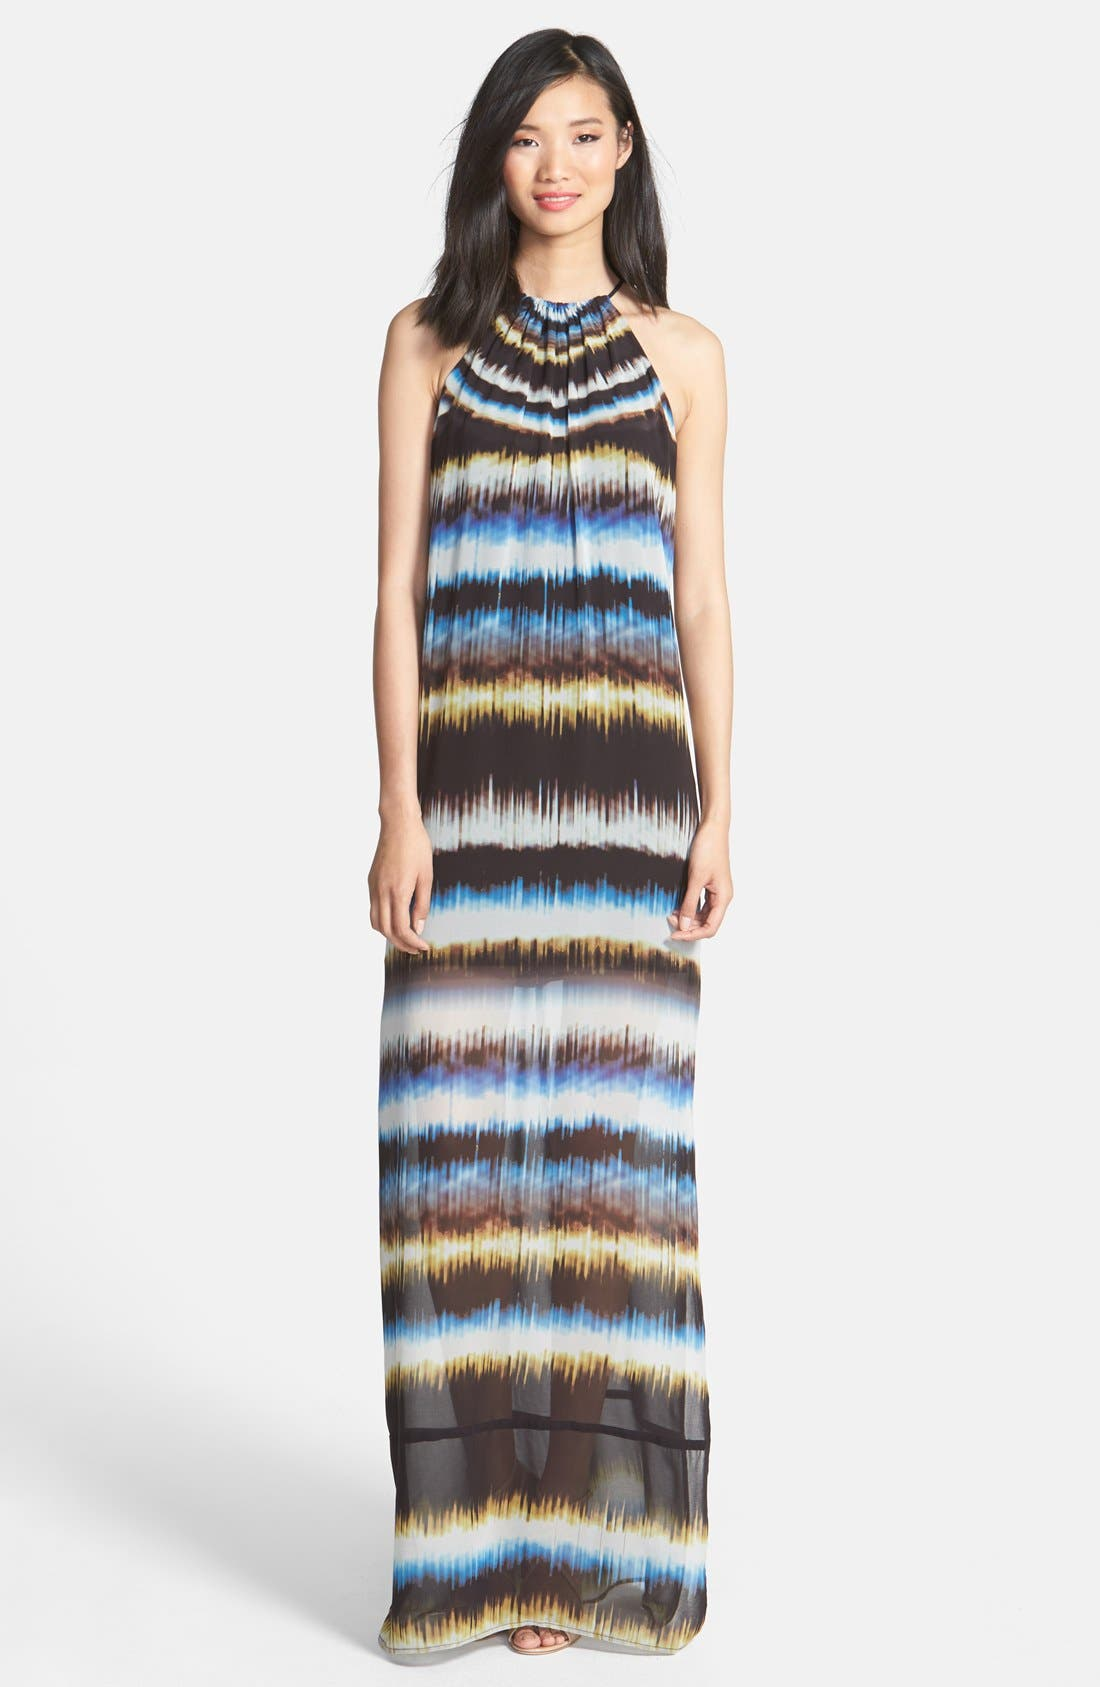 Alternate Image 1 Selected - Trina Turk 'Milian' Tie Dye Georgette Maxi Dress